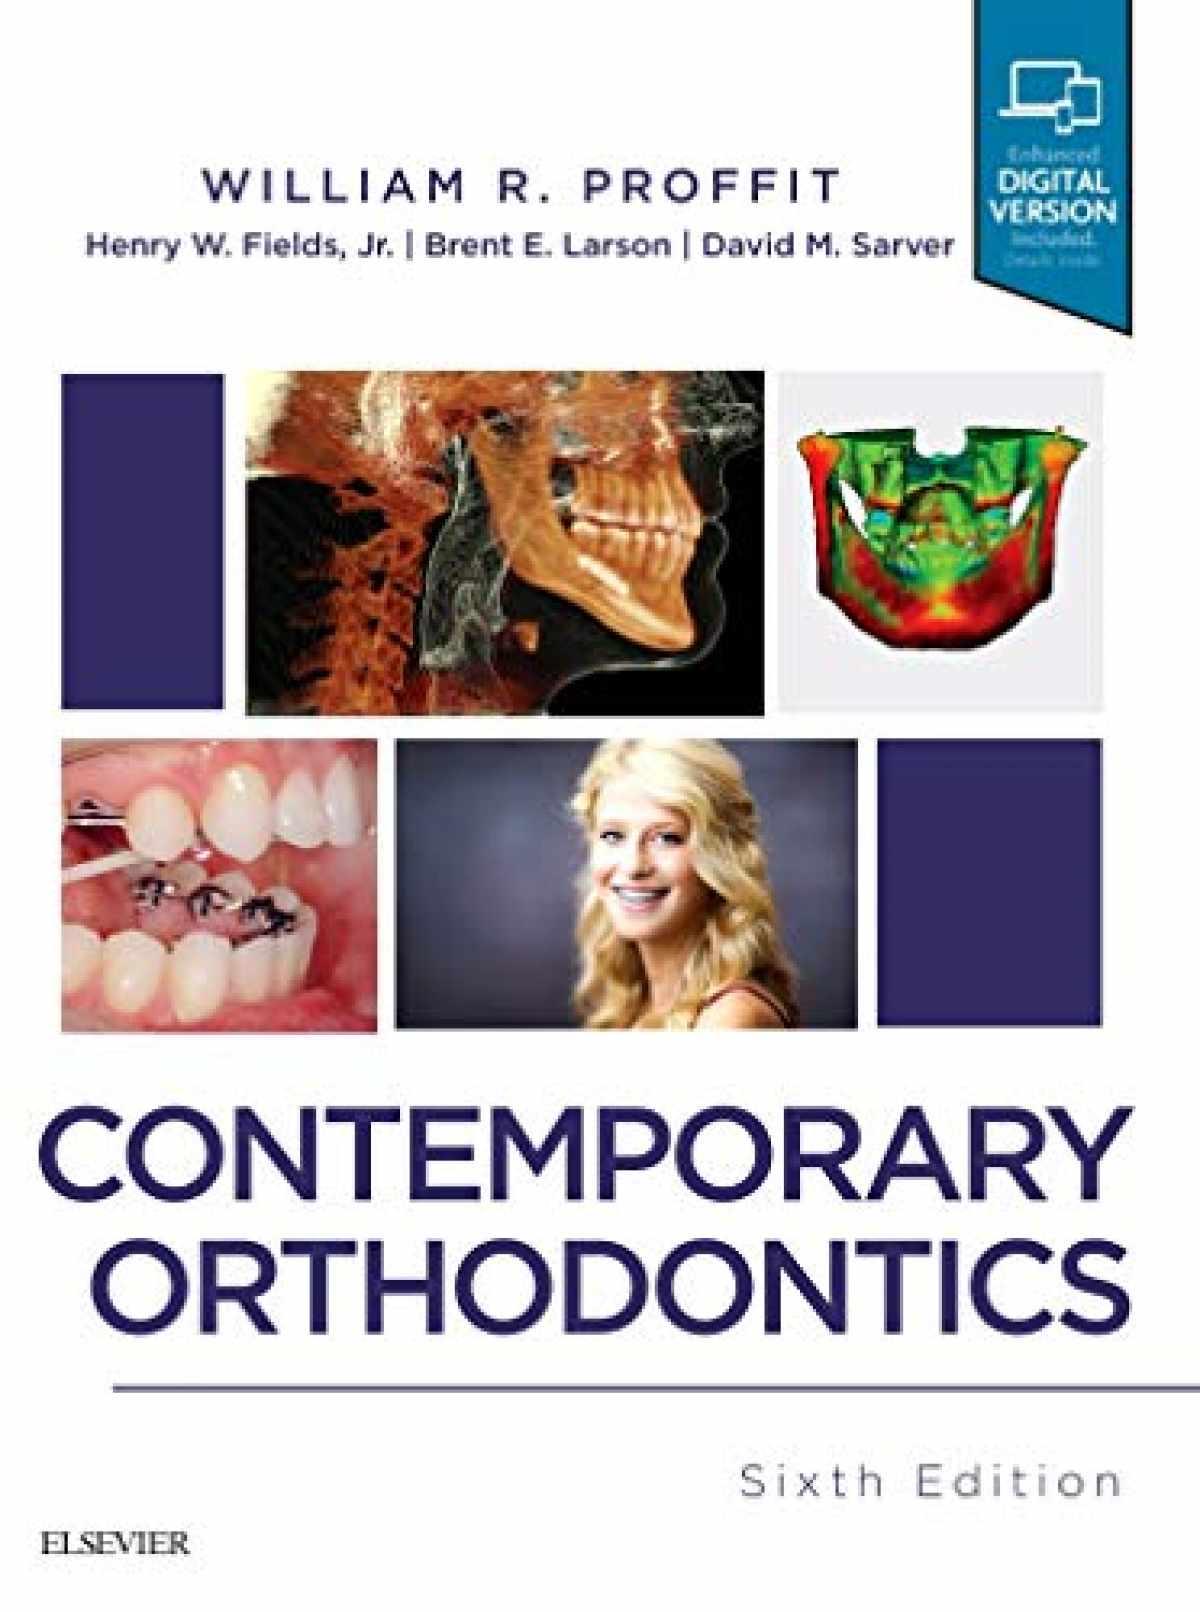 textbook of orthodontics by balaji pdf free download